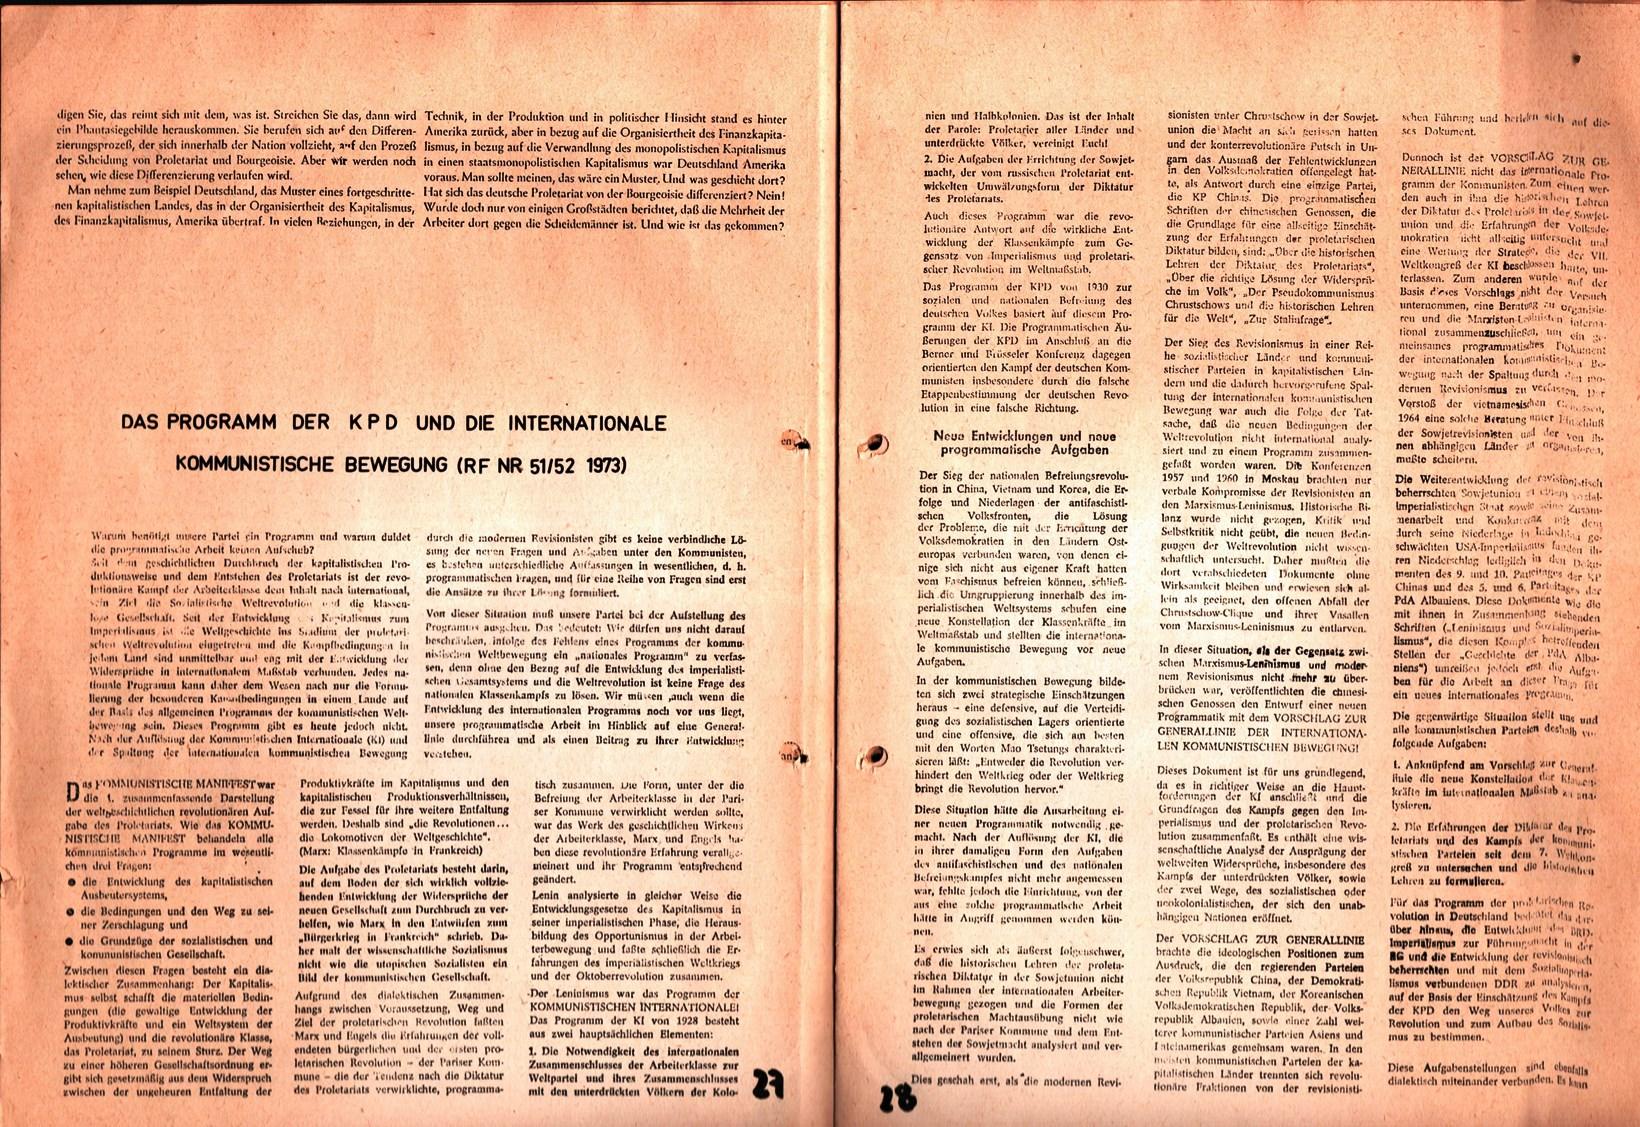 KSV_1974_Materialien_zur_Programmdiskussion_01_015